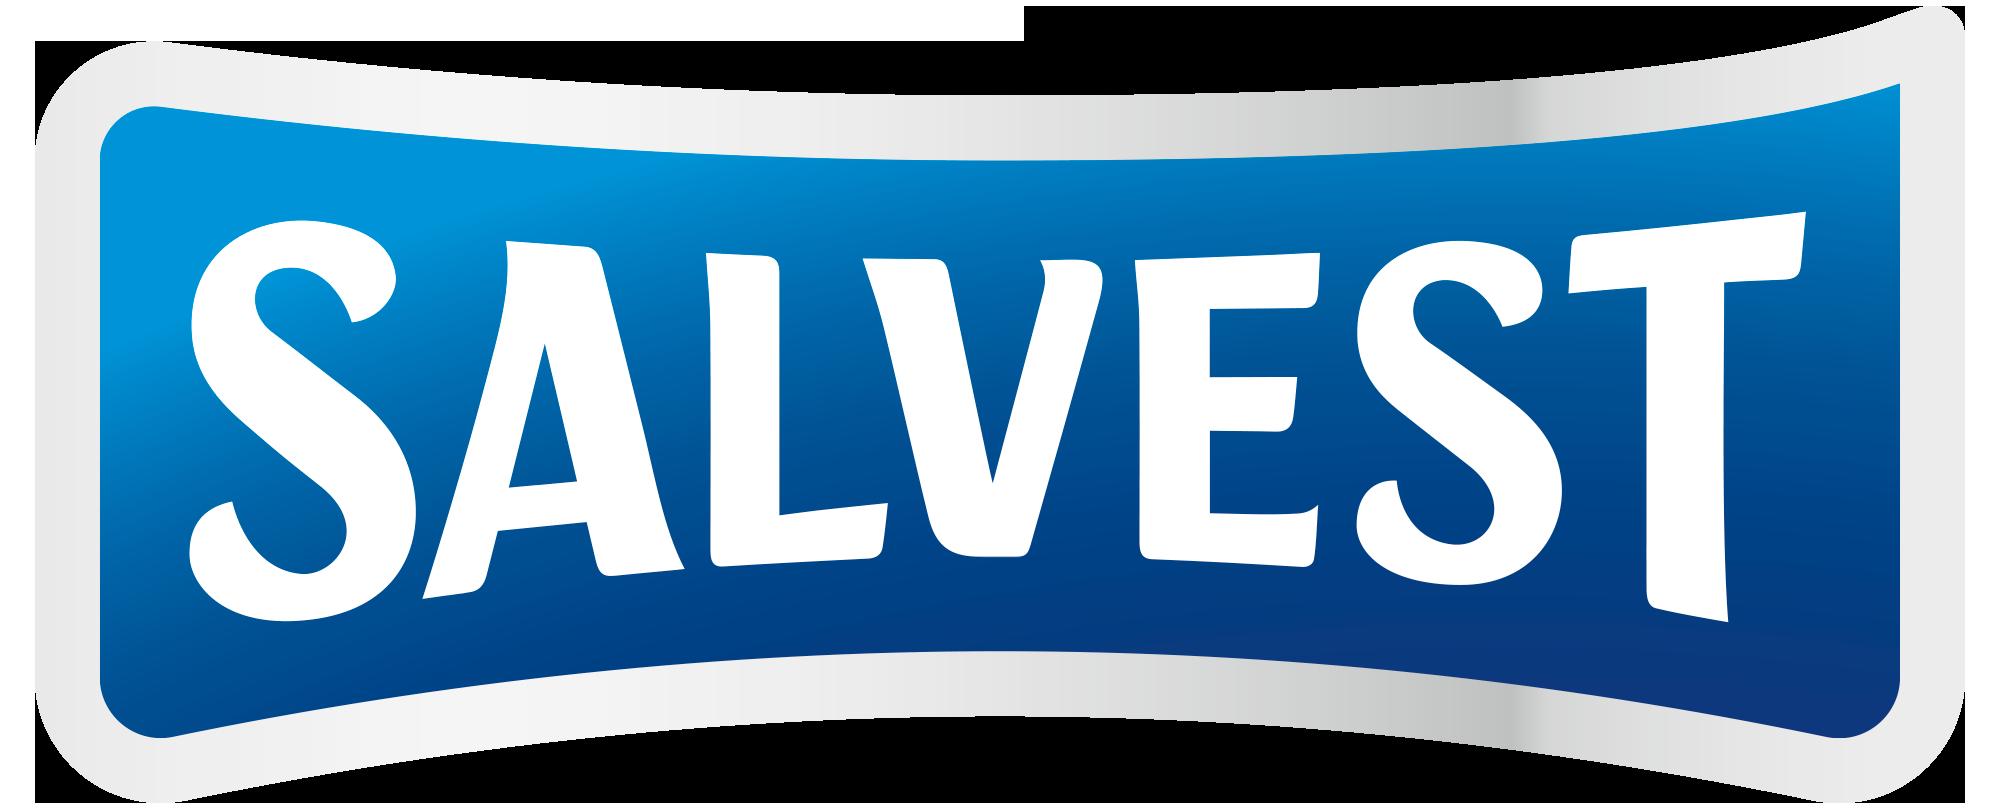 Salvest logo..png